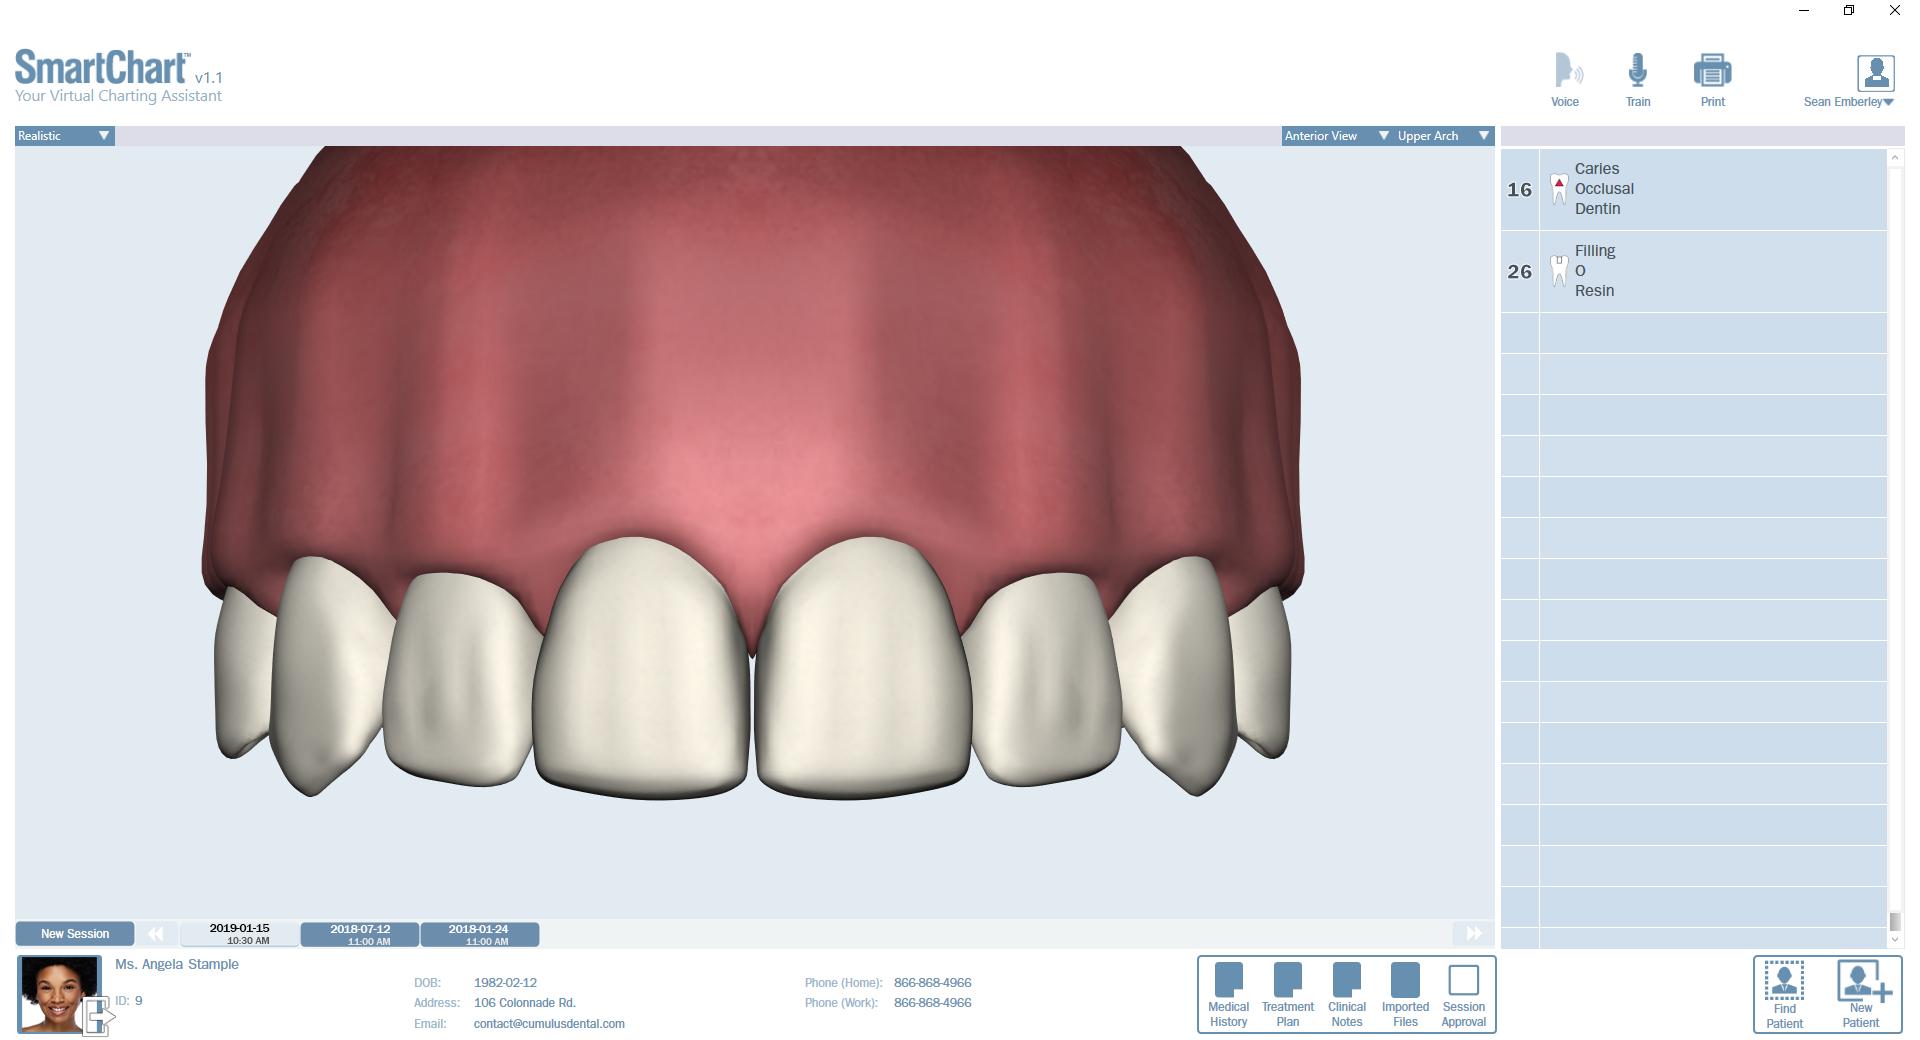 Patient1-Odontogram-Upper-Anterior.png